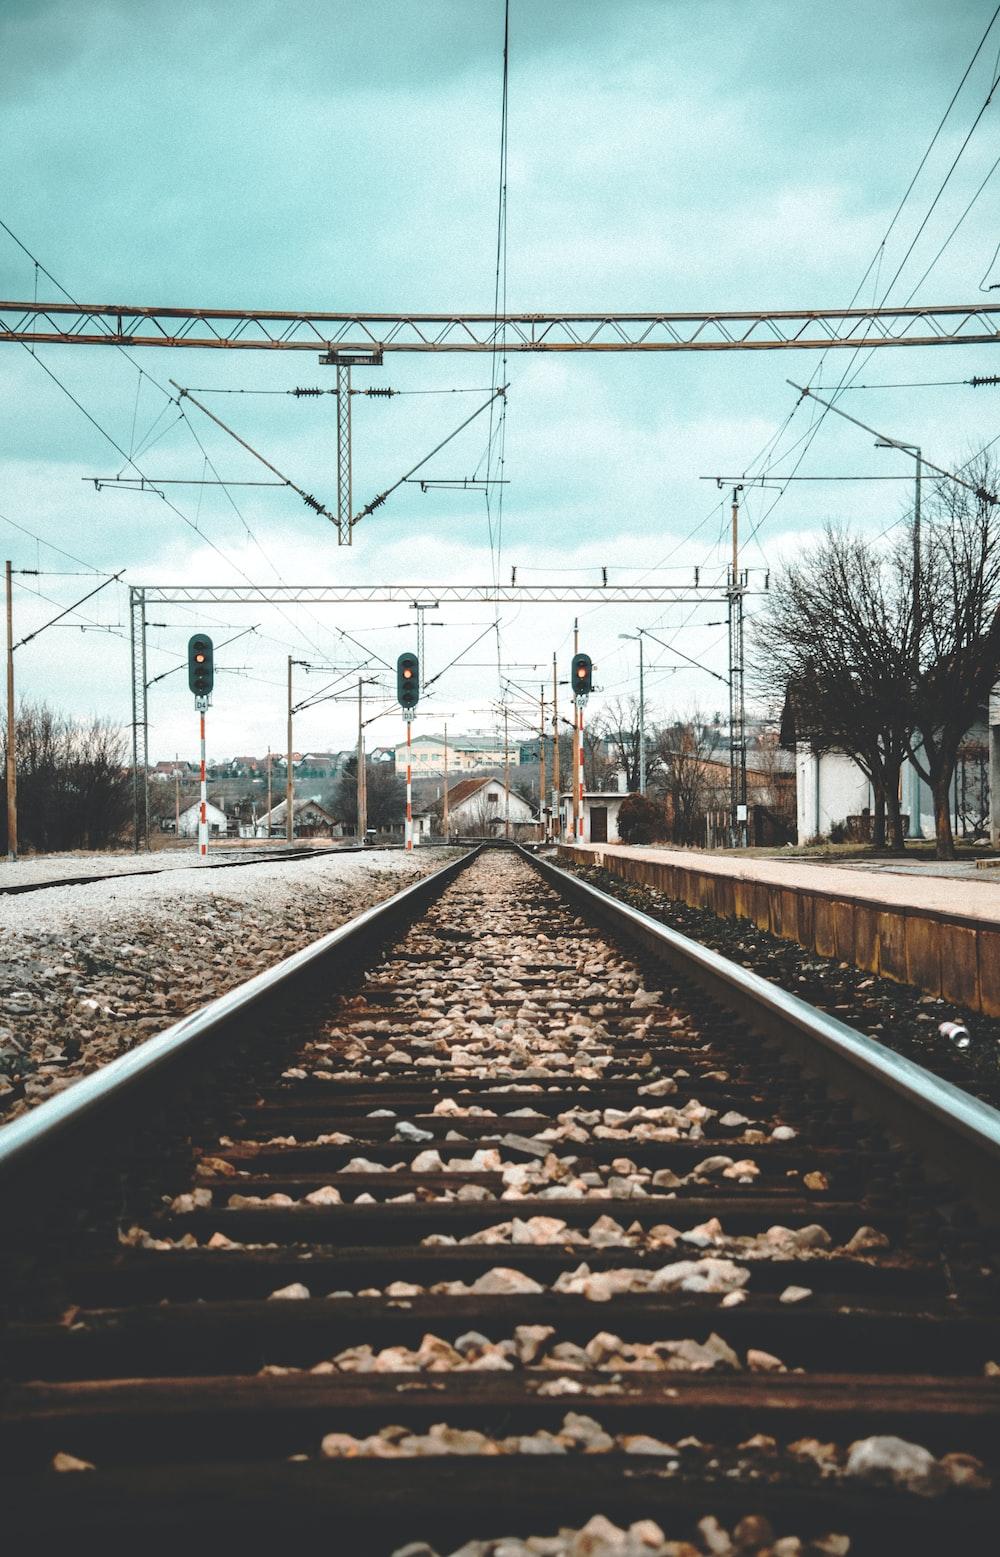 brown and black railway